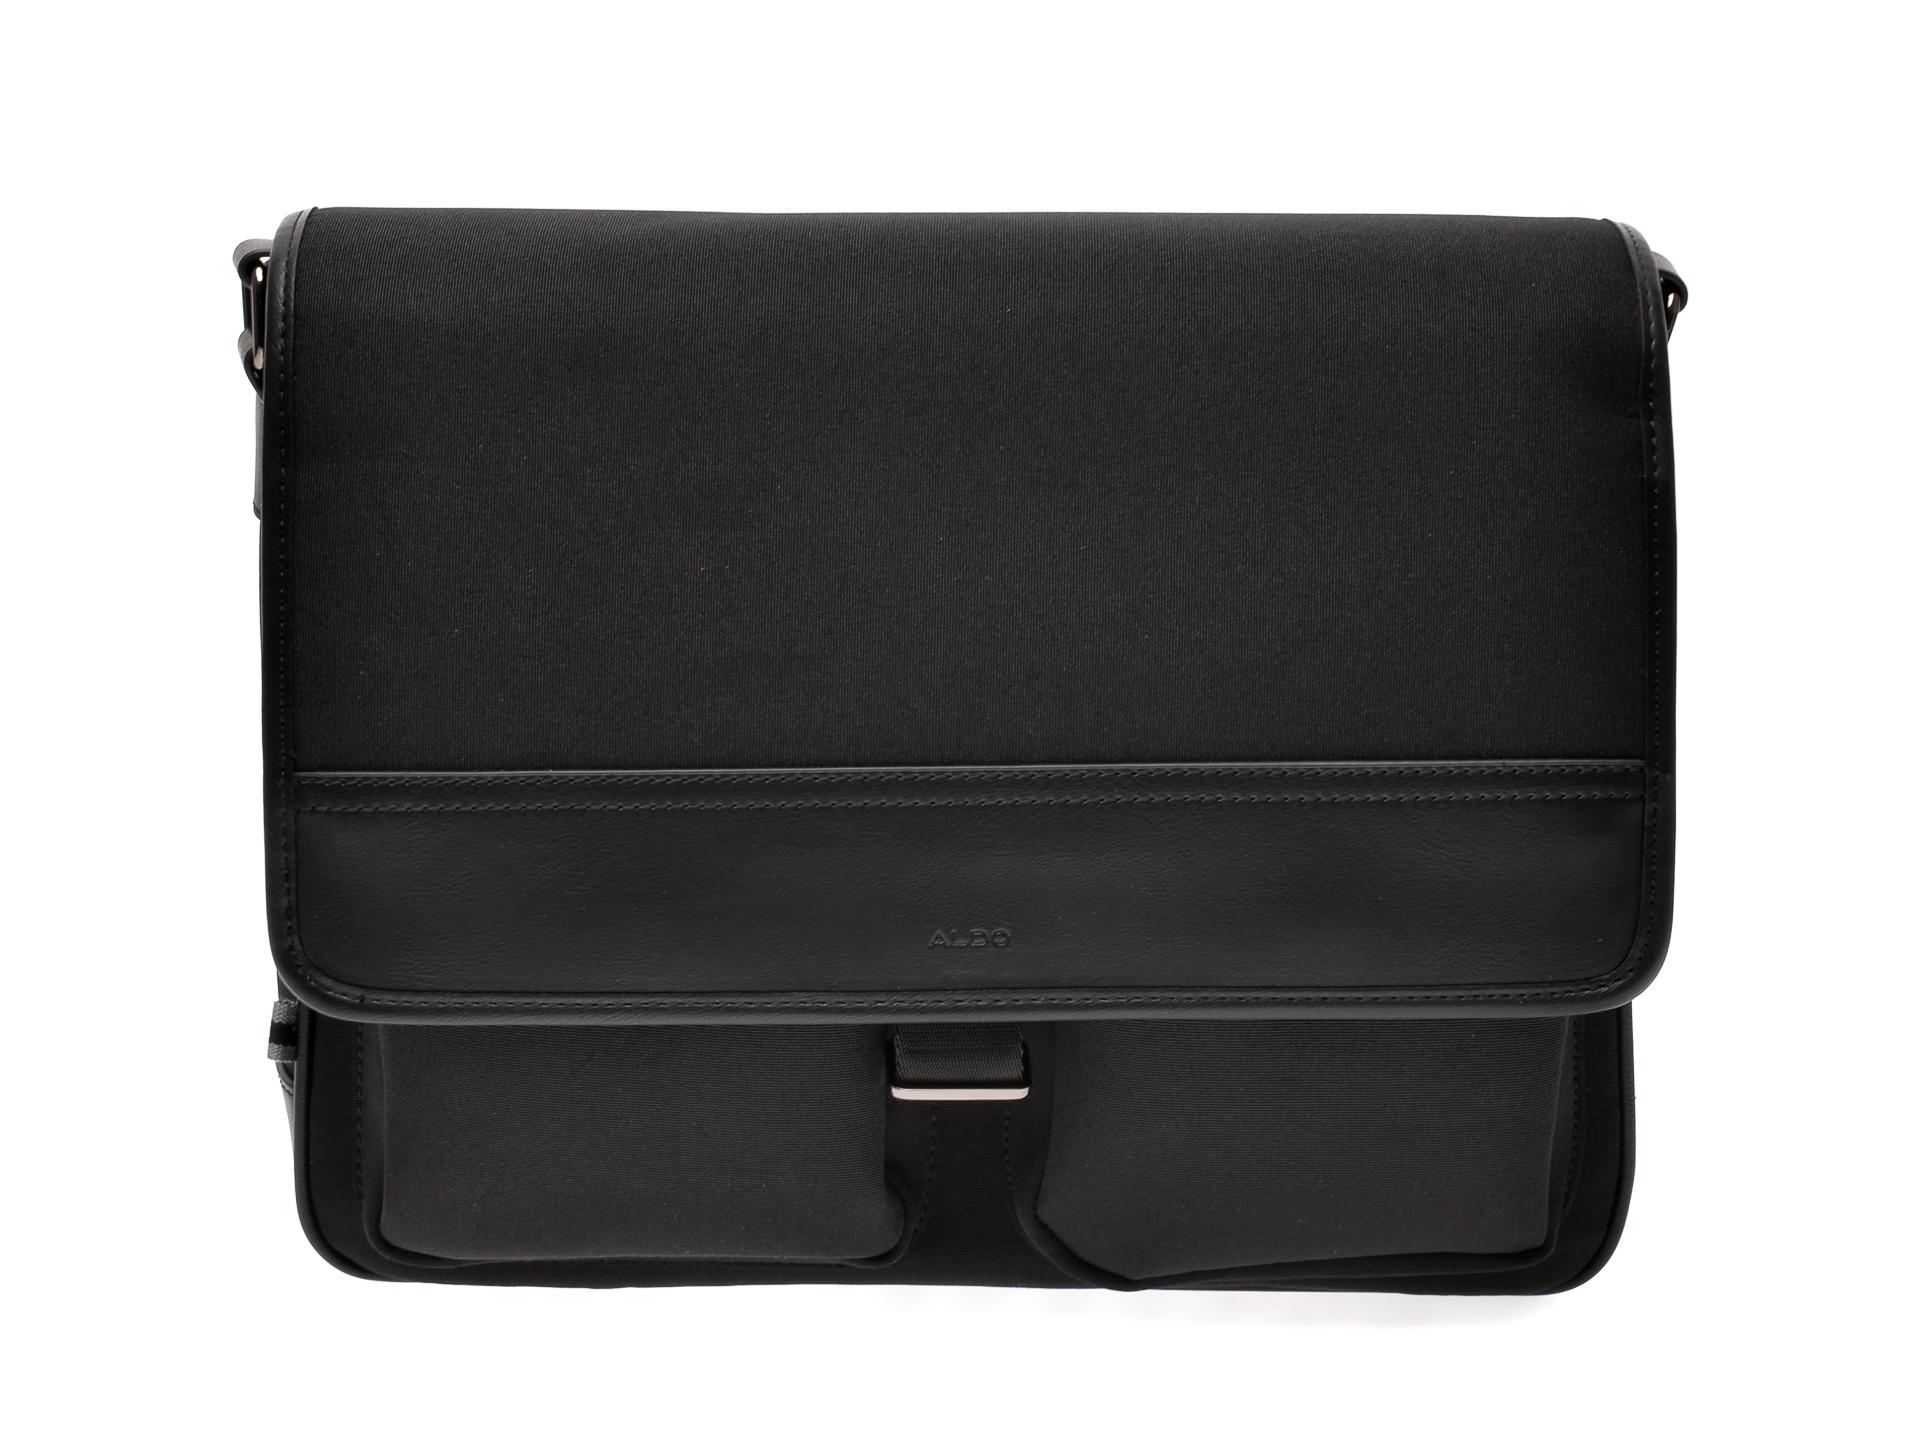 Geanta ALDO neagra, Nutans001, din material textil si piele ecologica imagine otter.ro